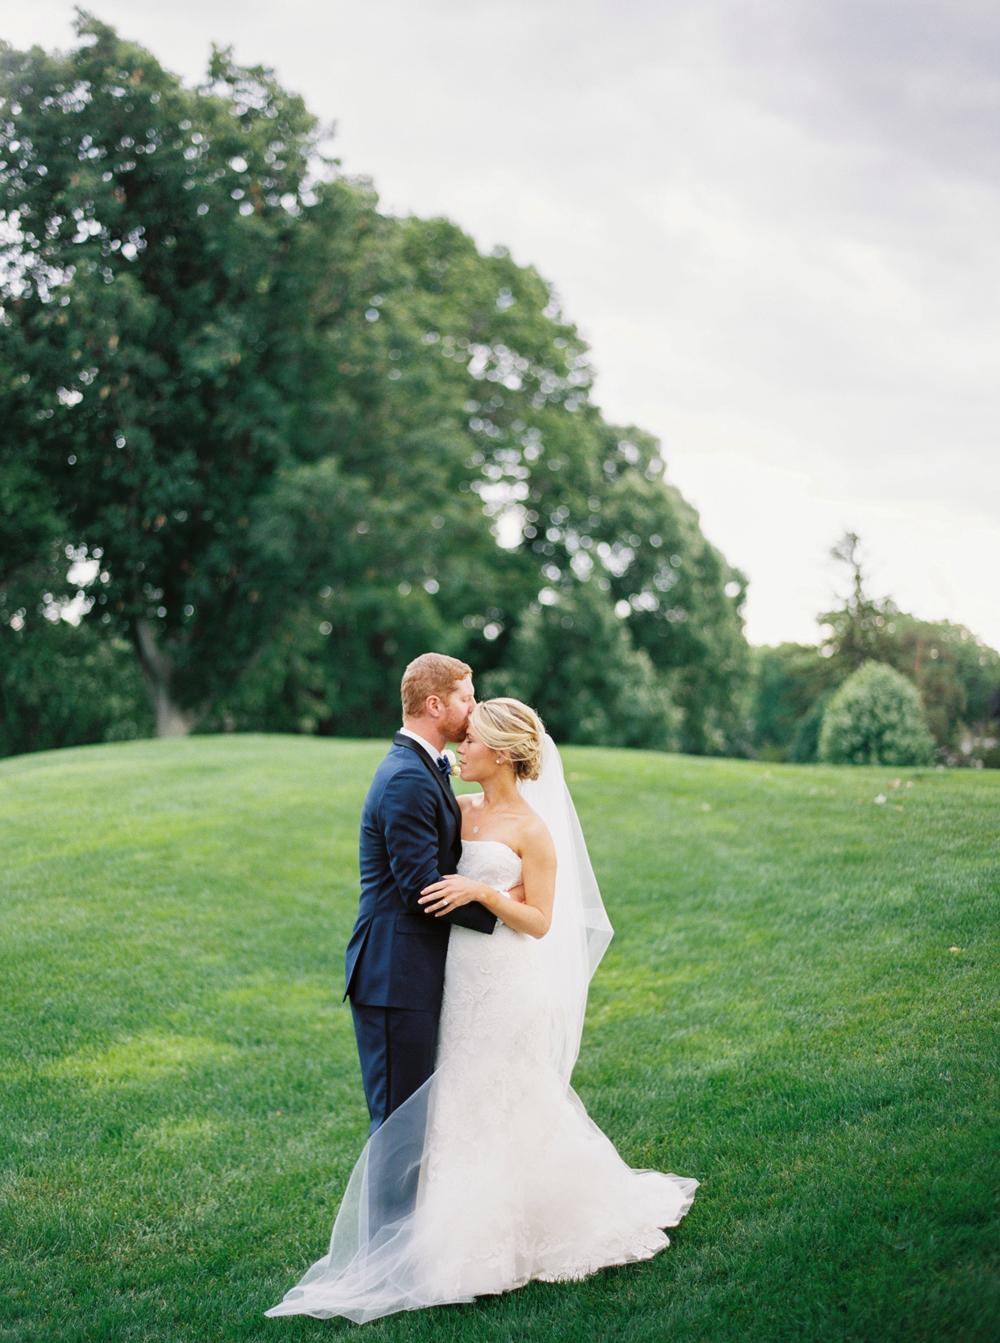 alexandra-elise-photography-ali-reed-caitlin-benn-film-oak-hill-wedding-018.jpg